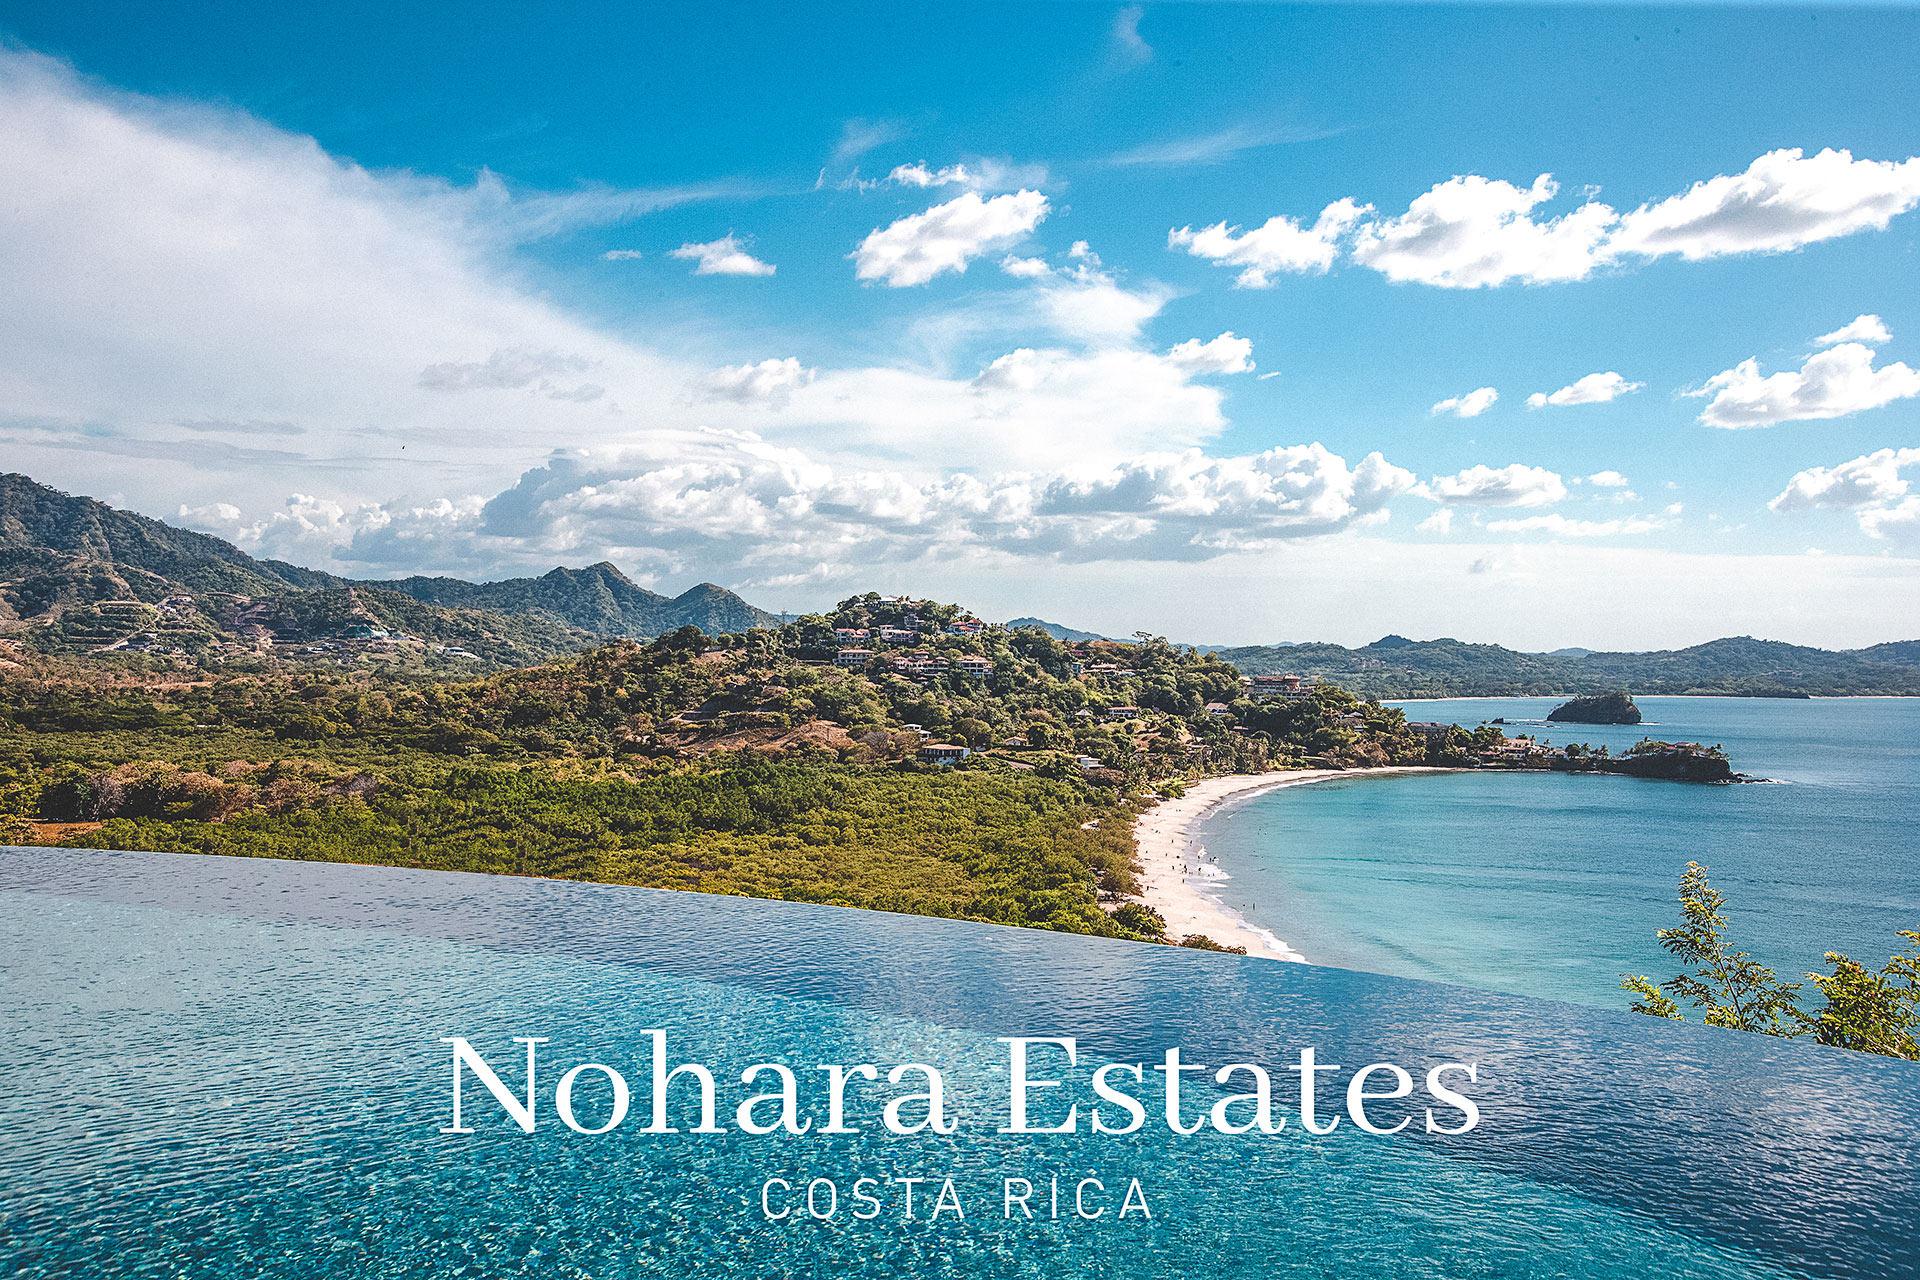 Nohara Estates Costa Rica Pacifico Playa Flamingo Pool Front Apartment 7